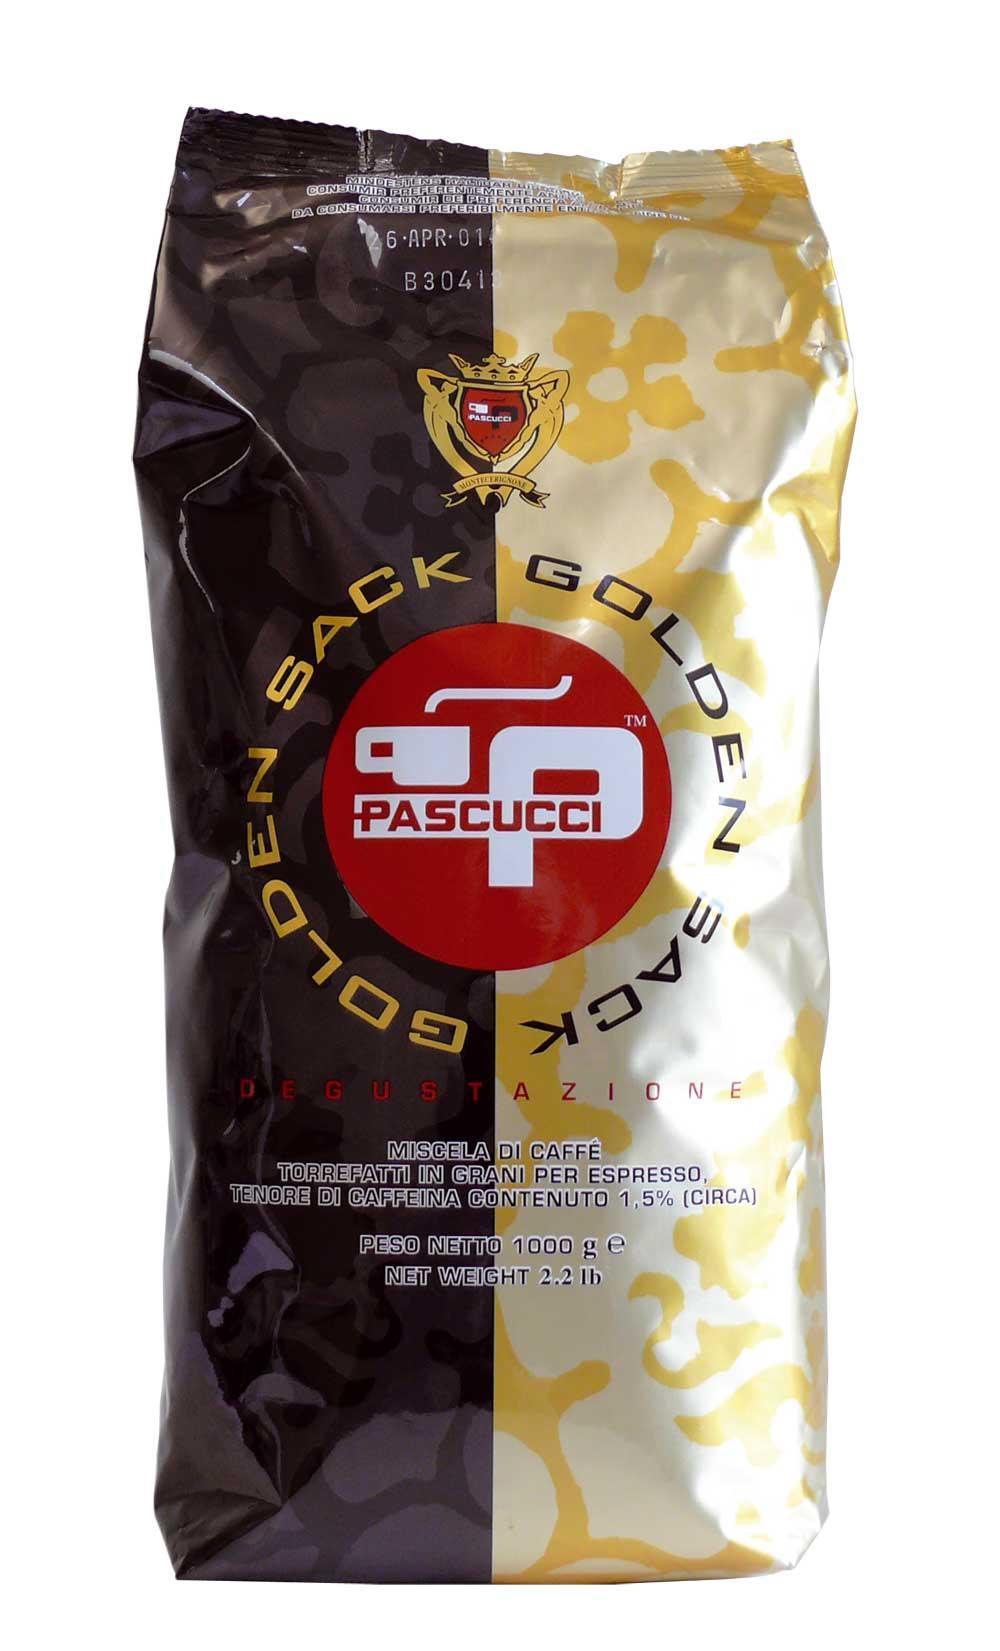 Pascucci Golden Sack Caffé